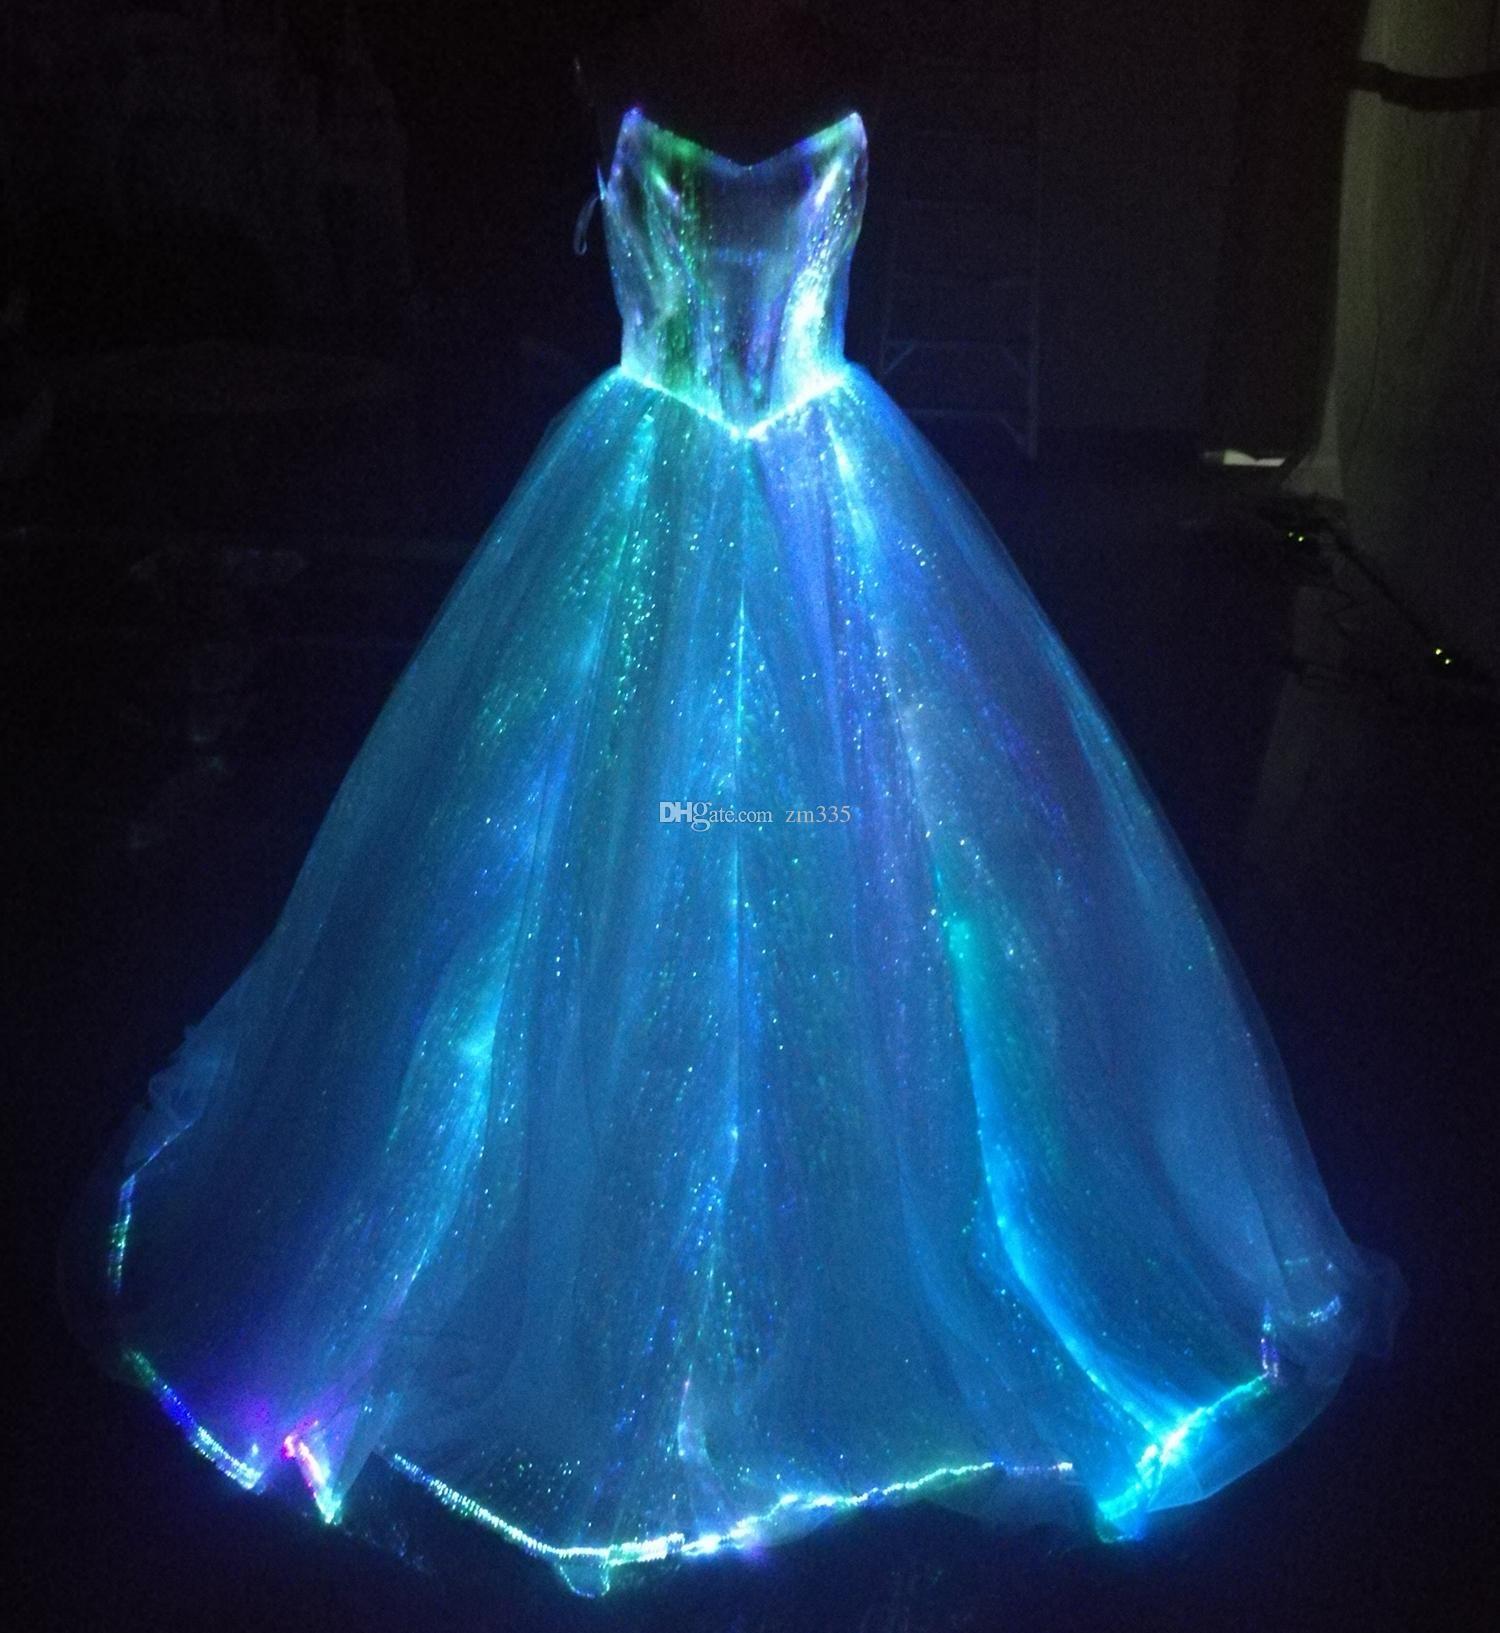 Fiber optic wedding dress  Fiber optic Light up ALine Spaghetti Strap Wedding Dresses Glow in